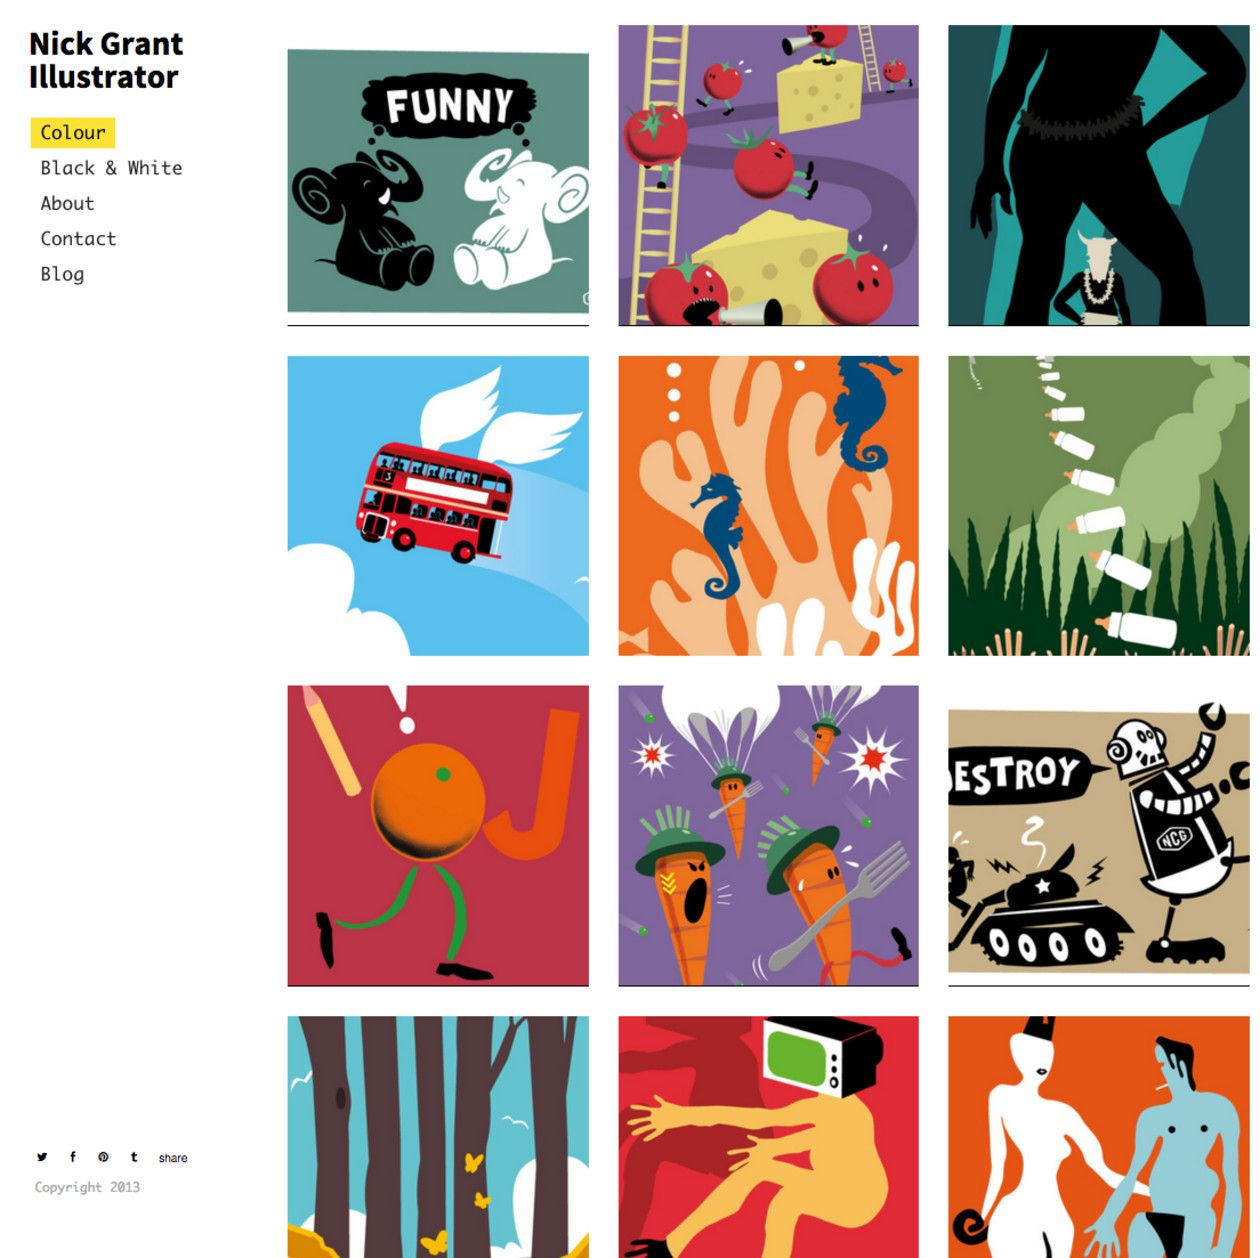 20 incredible illustration portfolio examples you should